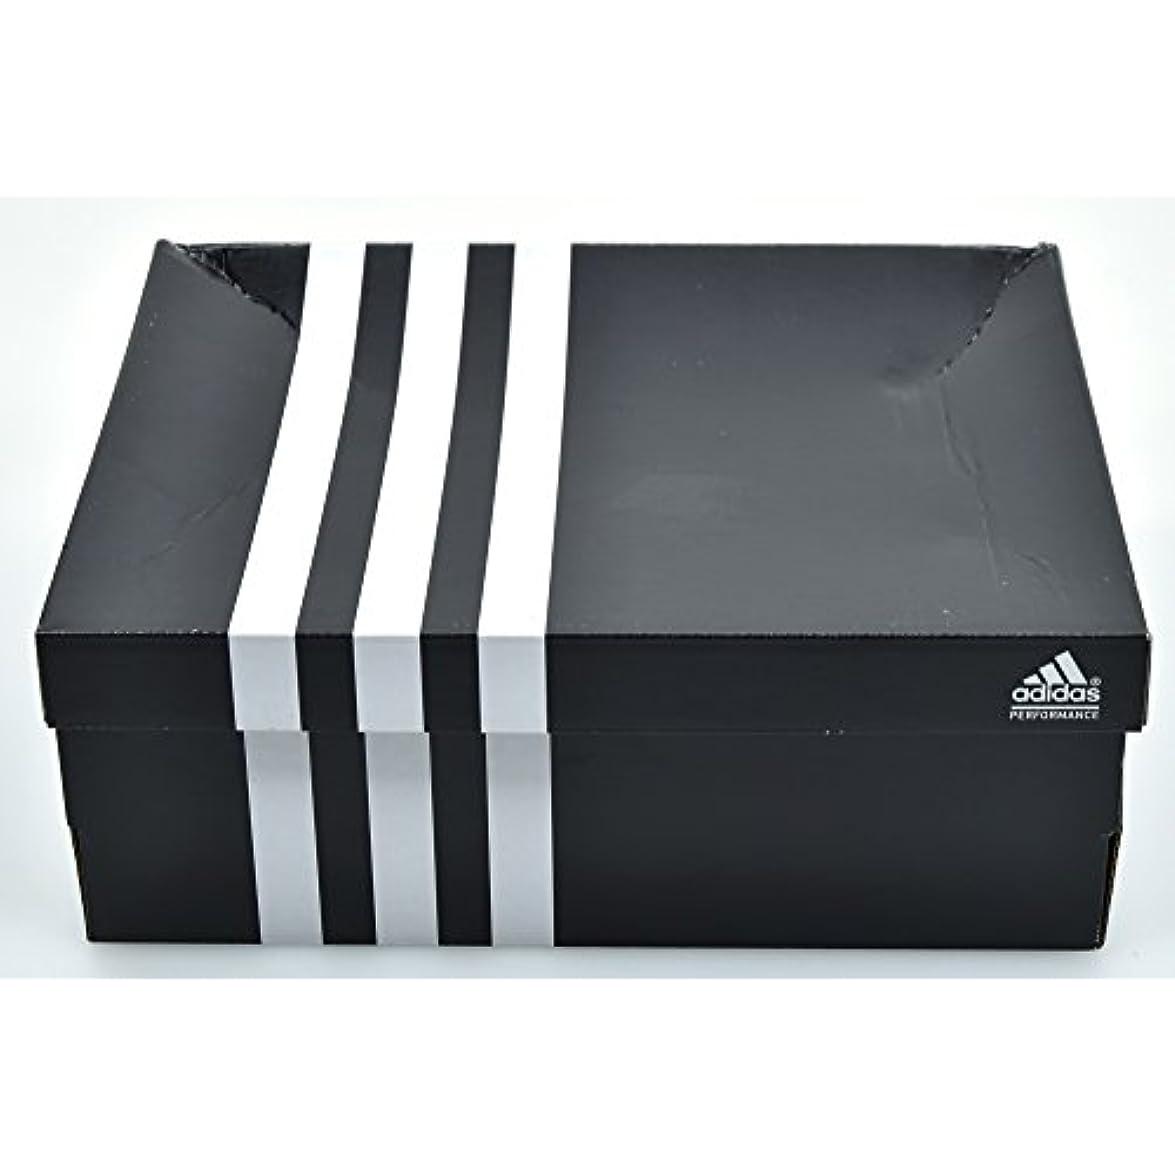 Adidas Scarpa Sneaker Basketball Donna Rosso nero Art D69635 Amplify J